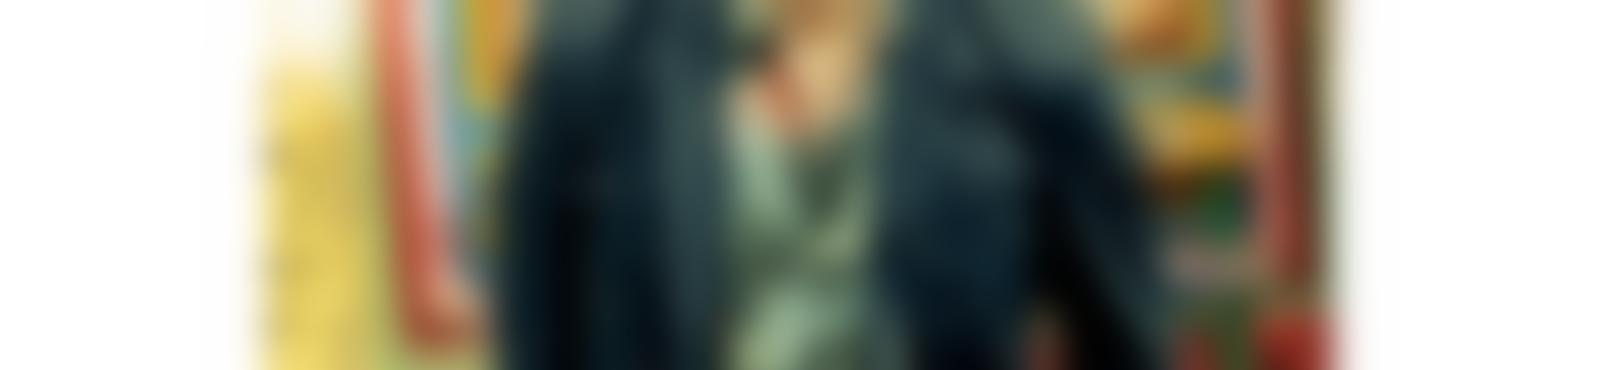 Blurred a0b2fc56 4cc6 4f36 bc66 19029699caf2